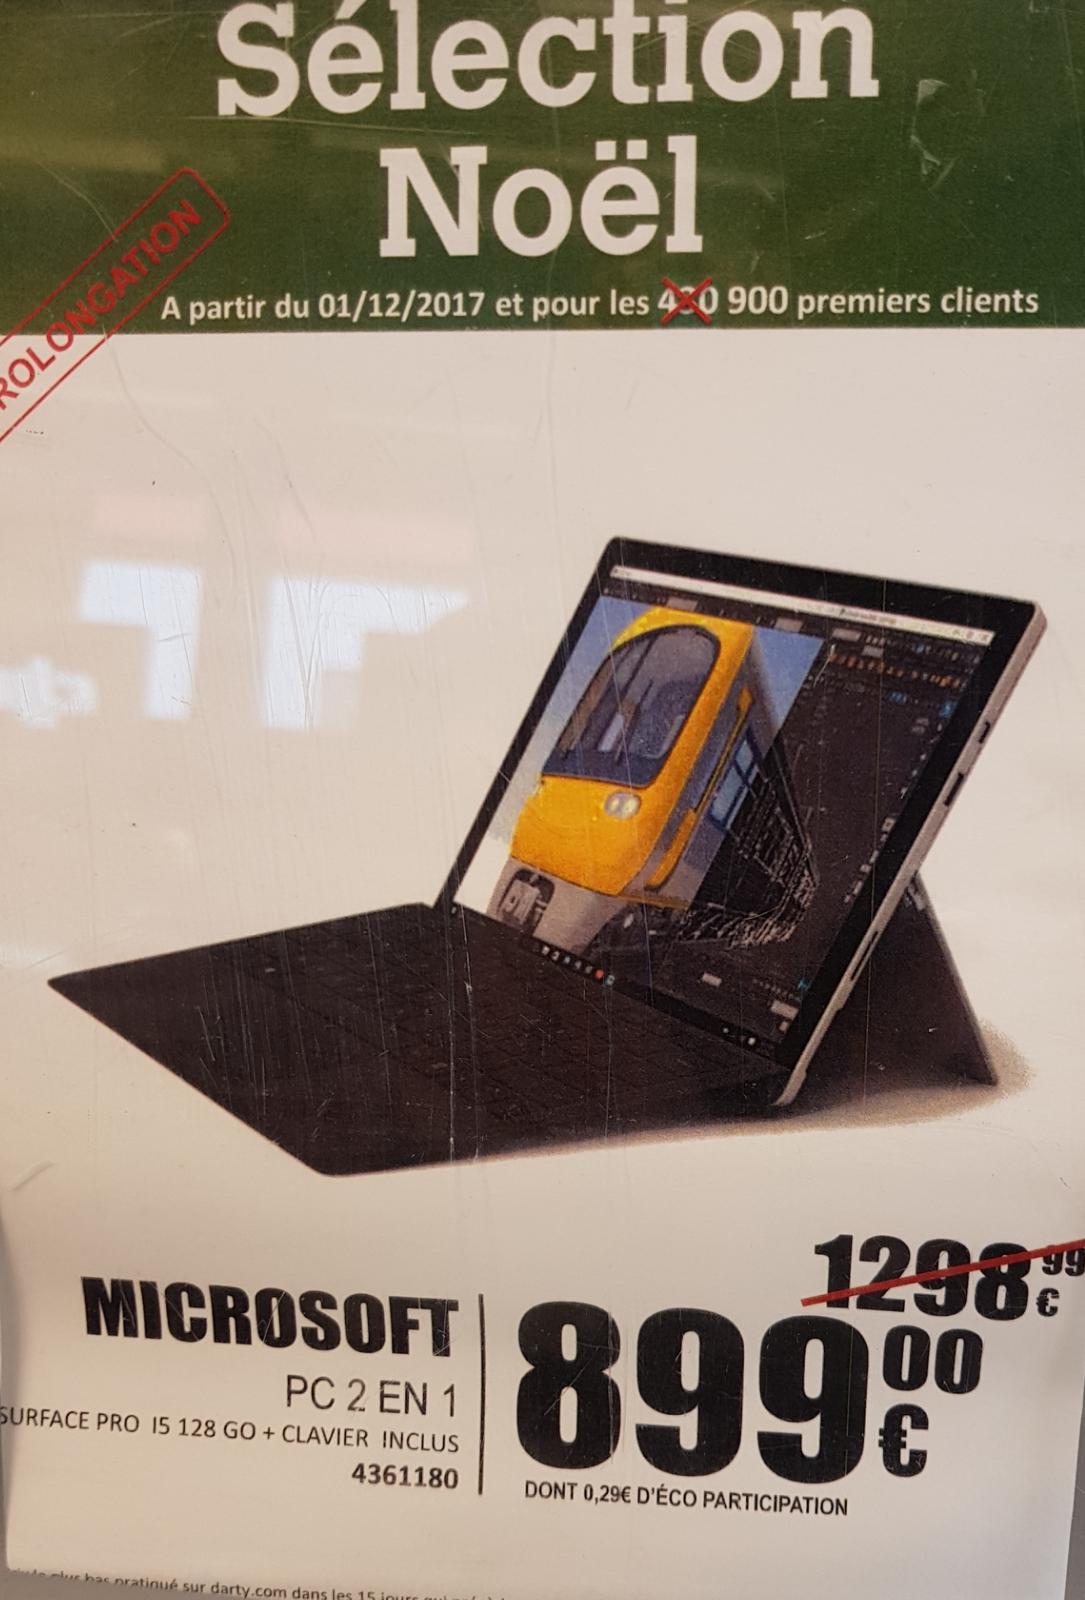 Microsoft Surface Pro - i5, 128 Go + Clavier Type Cover Noir inclus - Gramont (31)